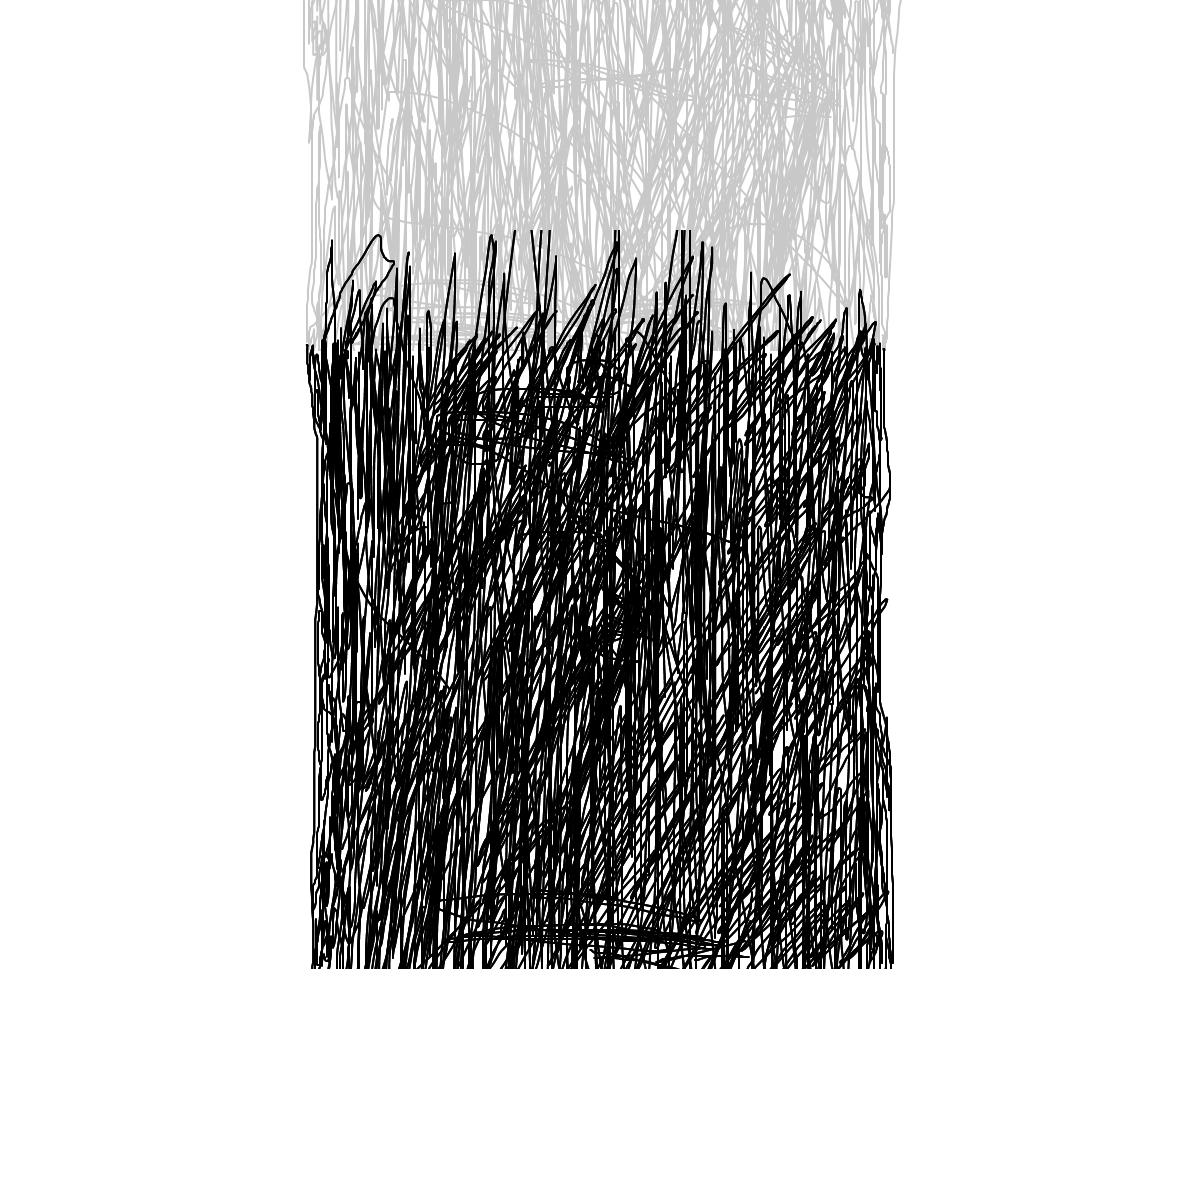 BAAAM drawing#15347 lat:40.9137763977050800lng: -74.5035629272461000